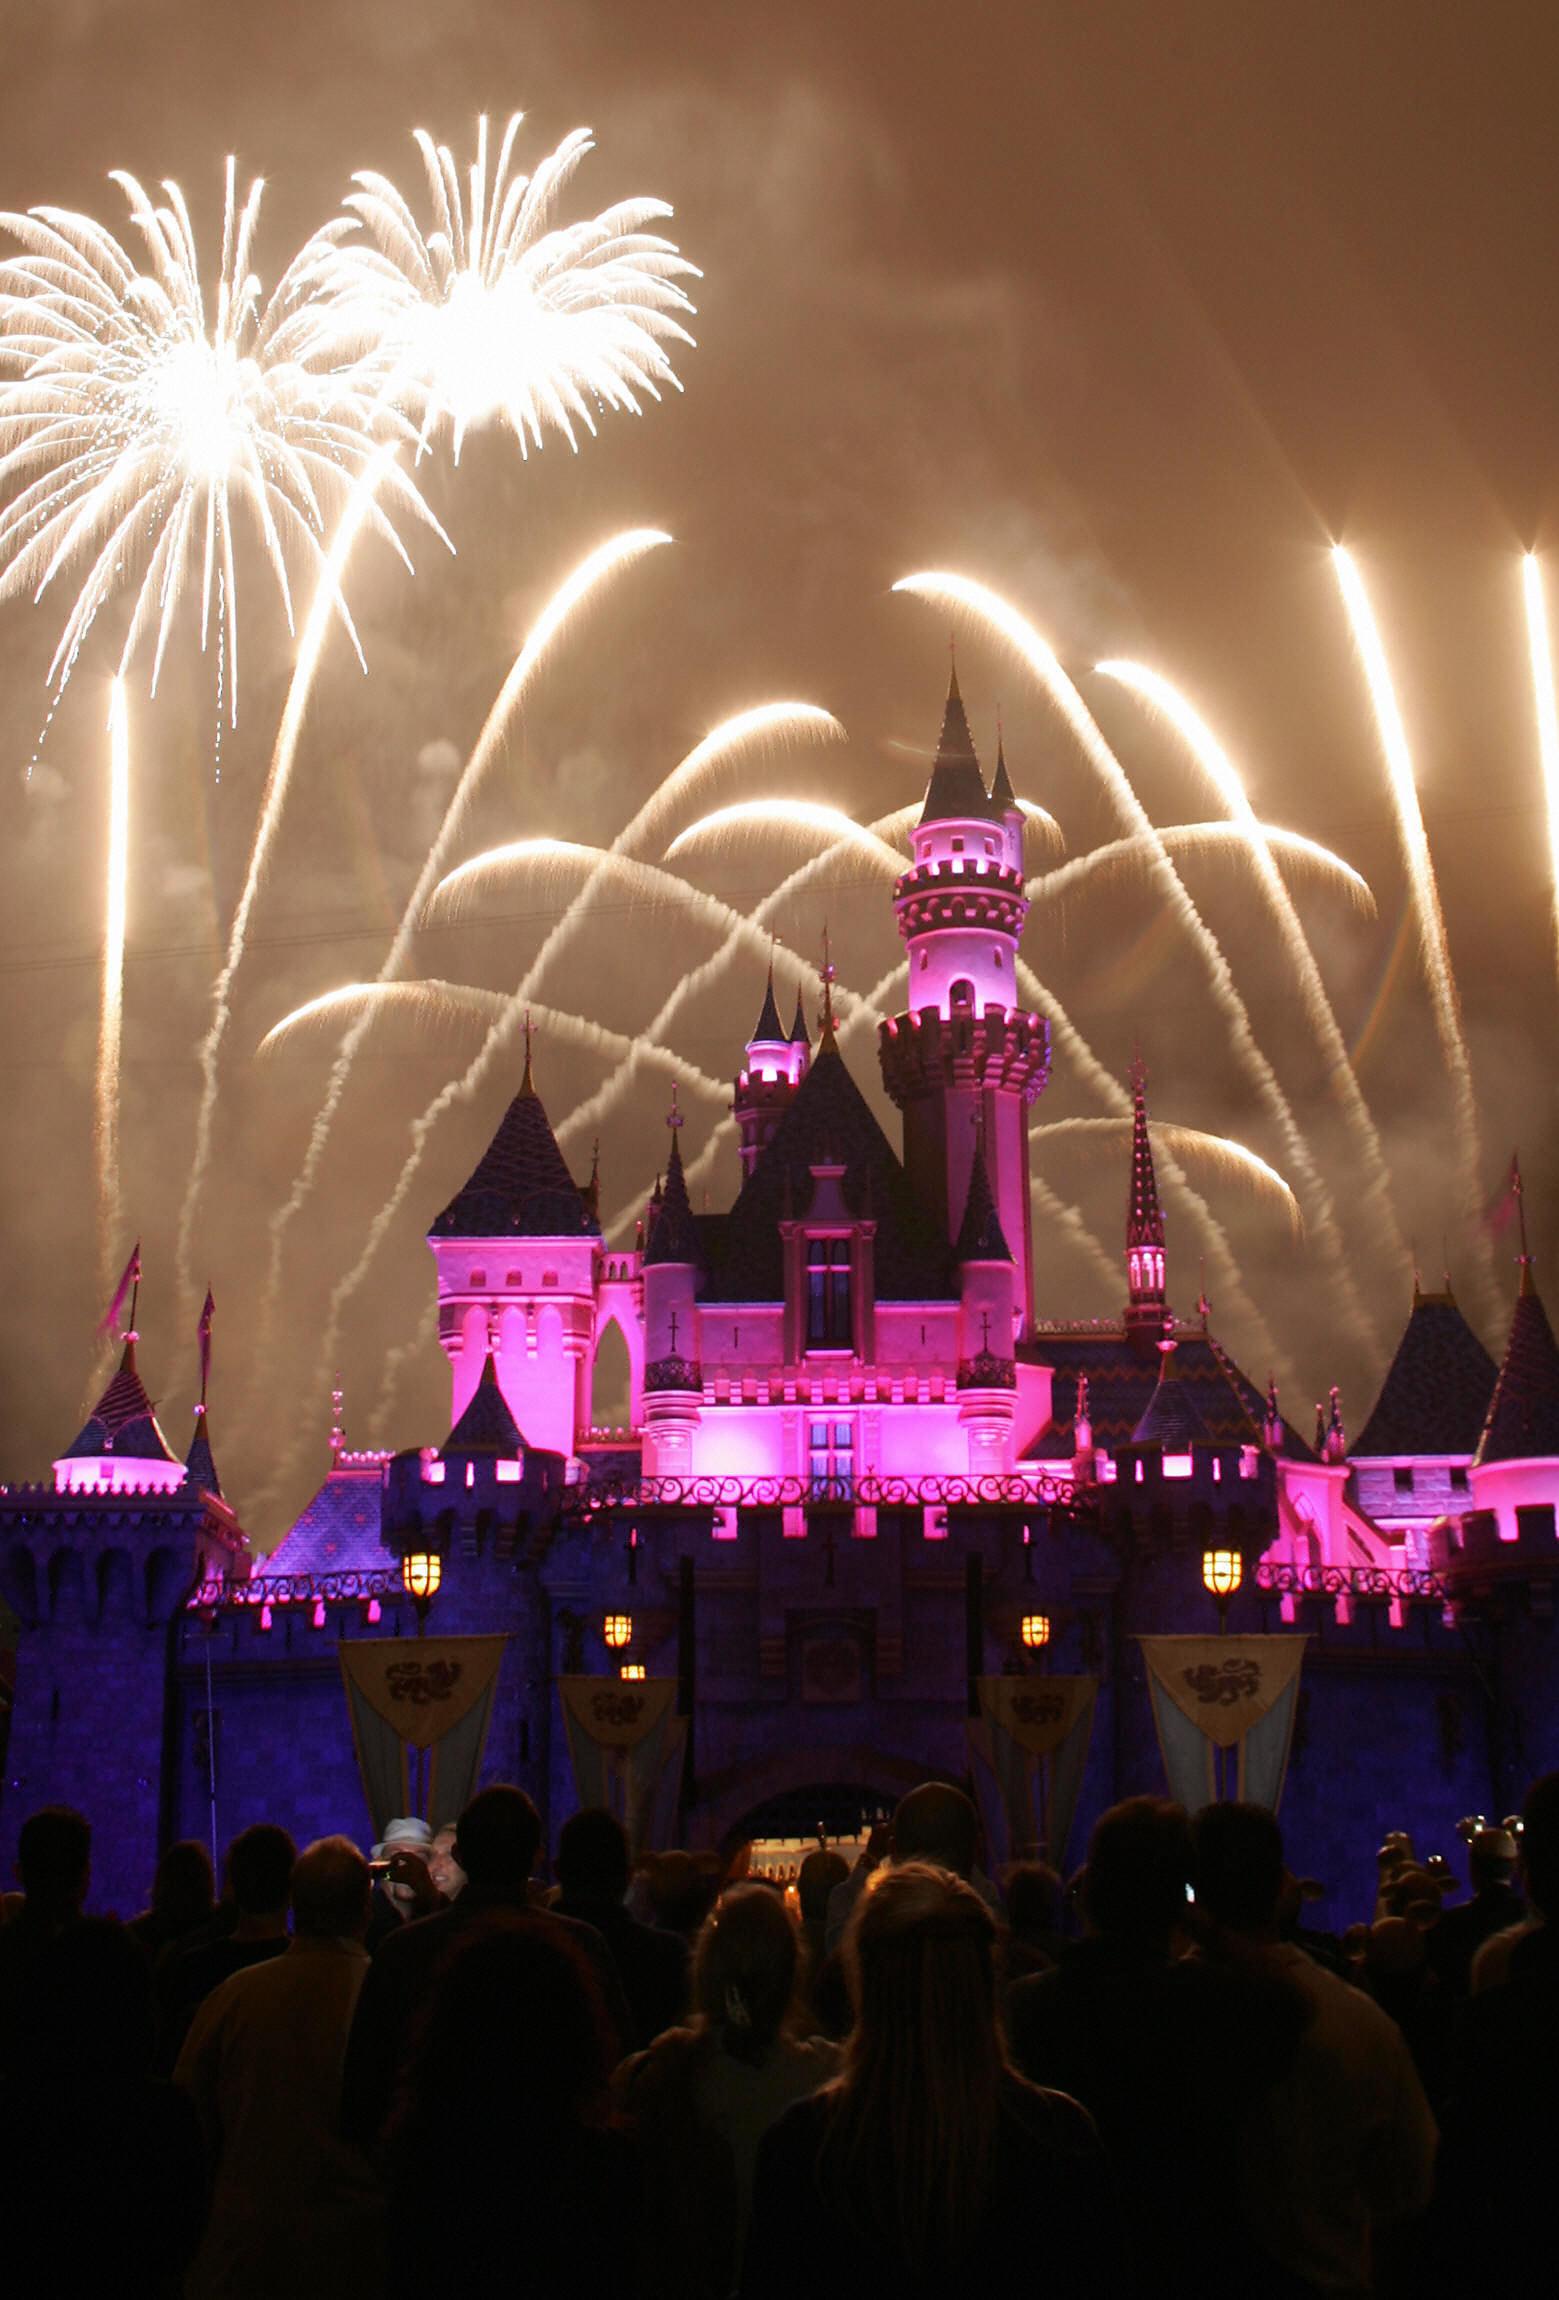 Disney fireworks, Disneyland, Disney World